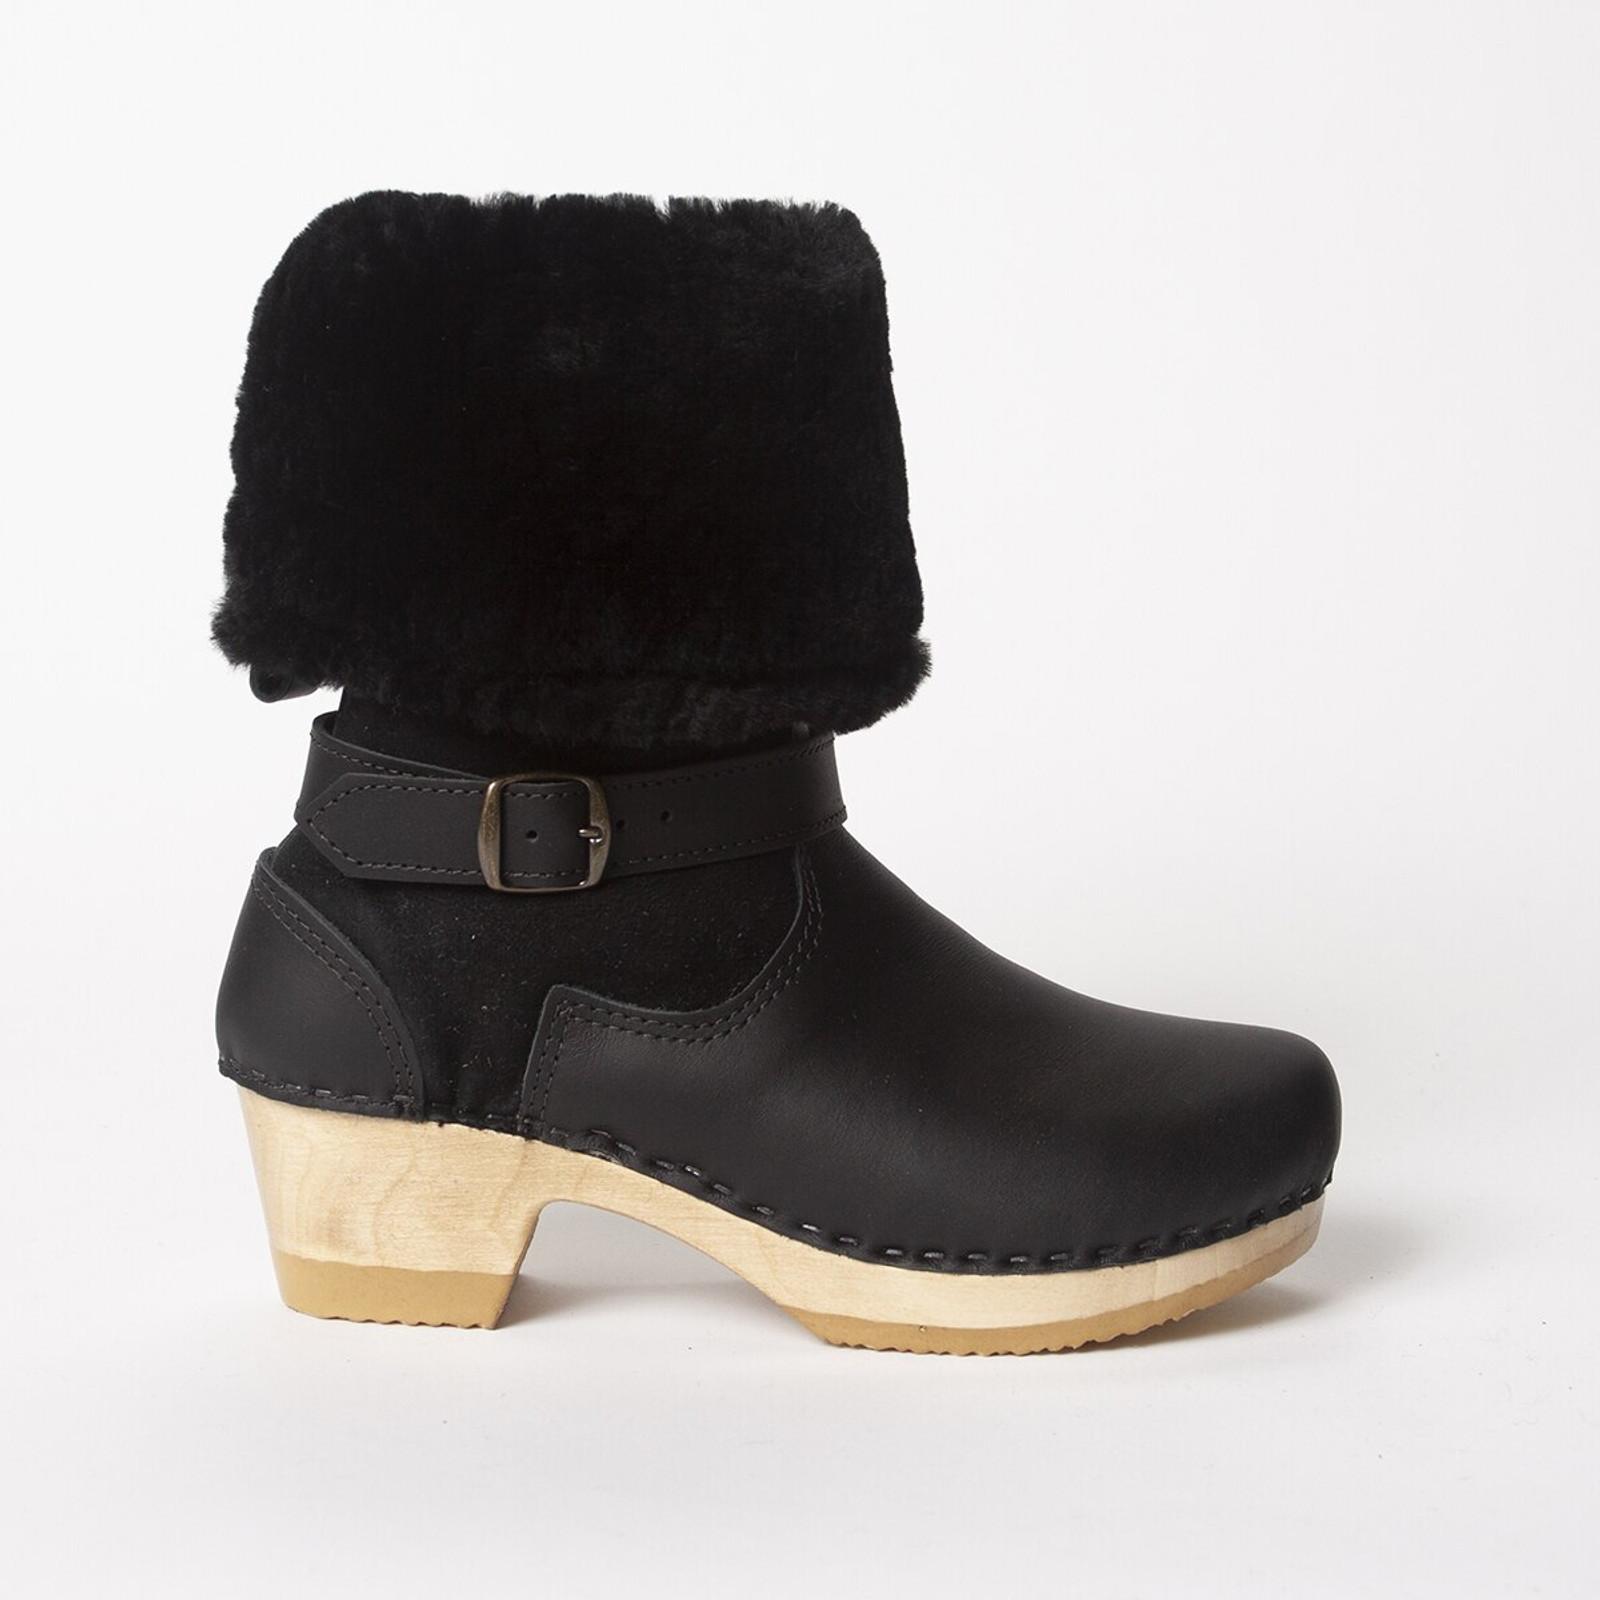 "11"" Shearling Clog Boots -Bendable Mid Heels"